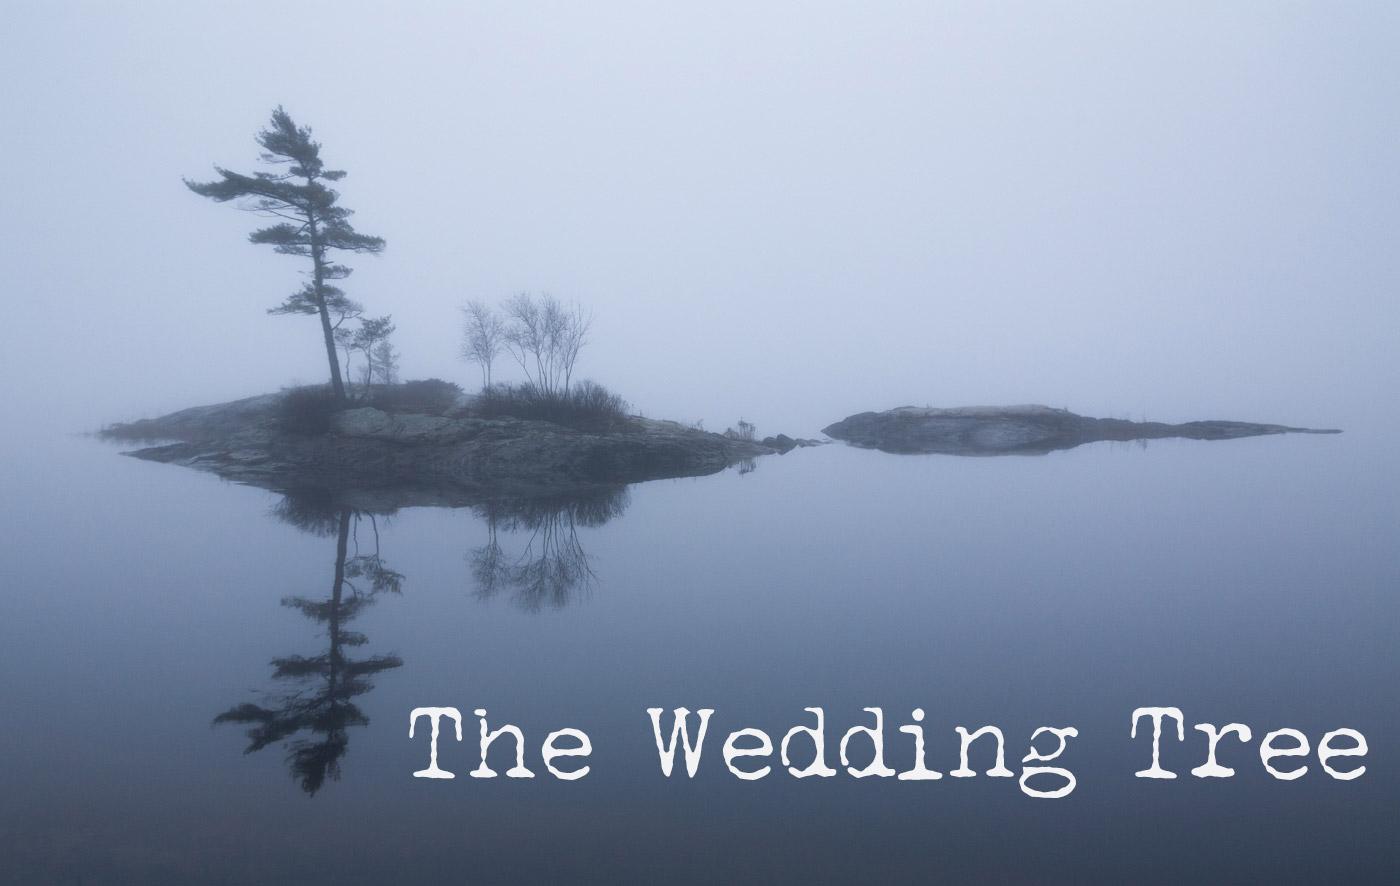 wedding-tree-poster.jpg